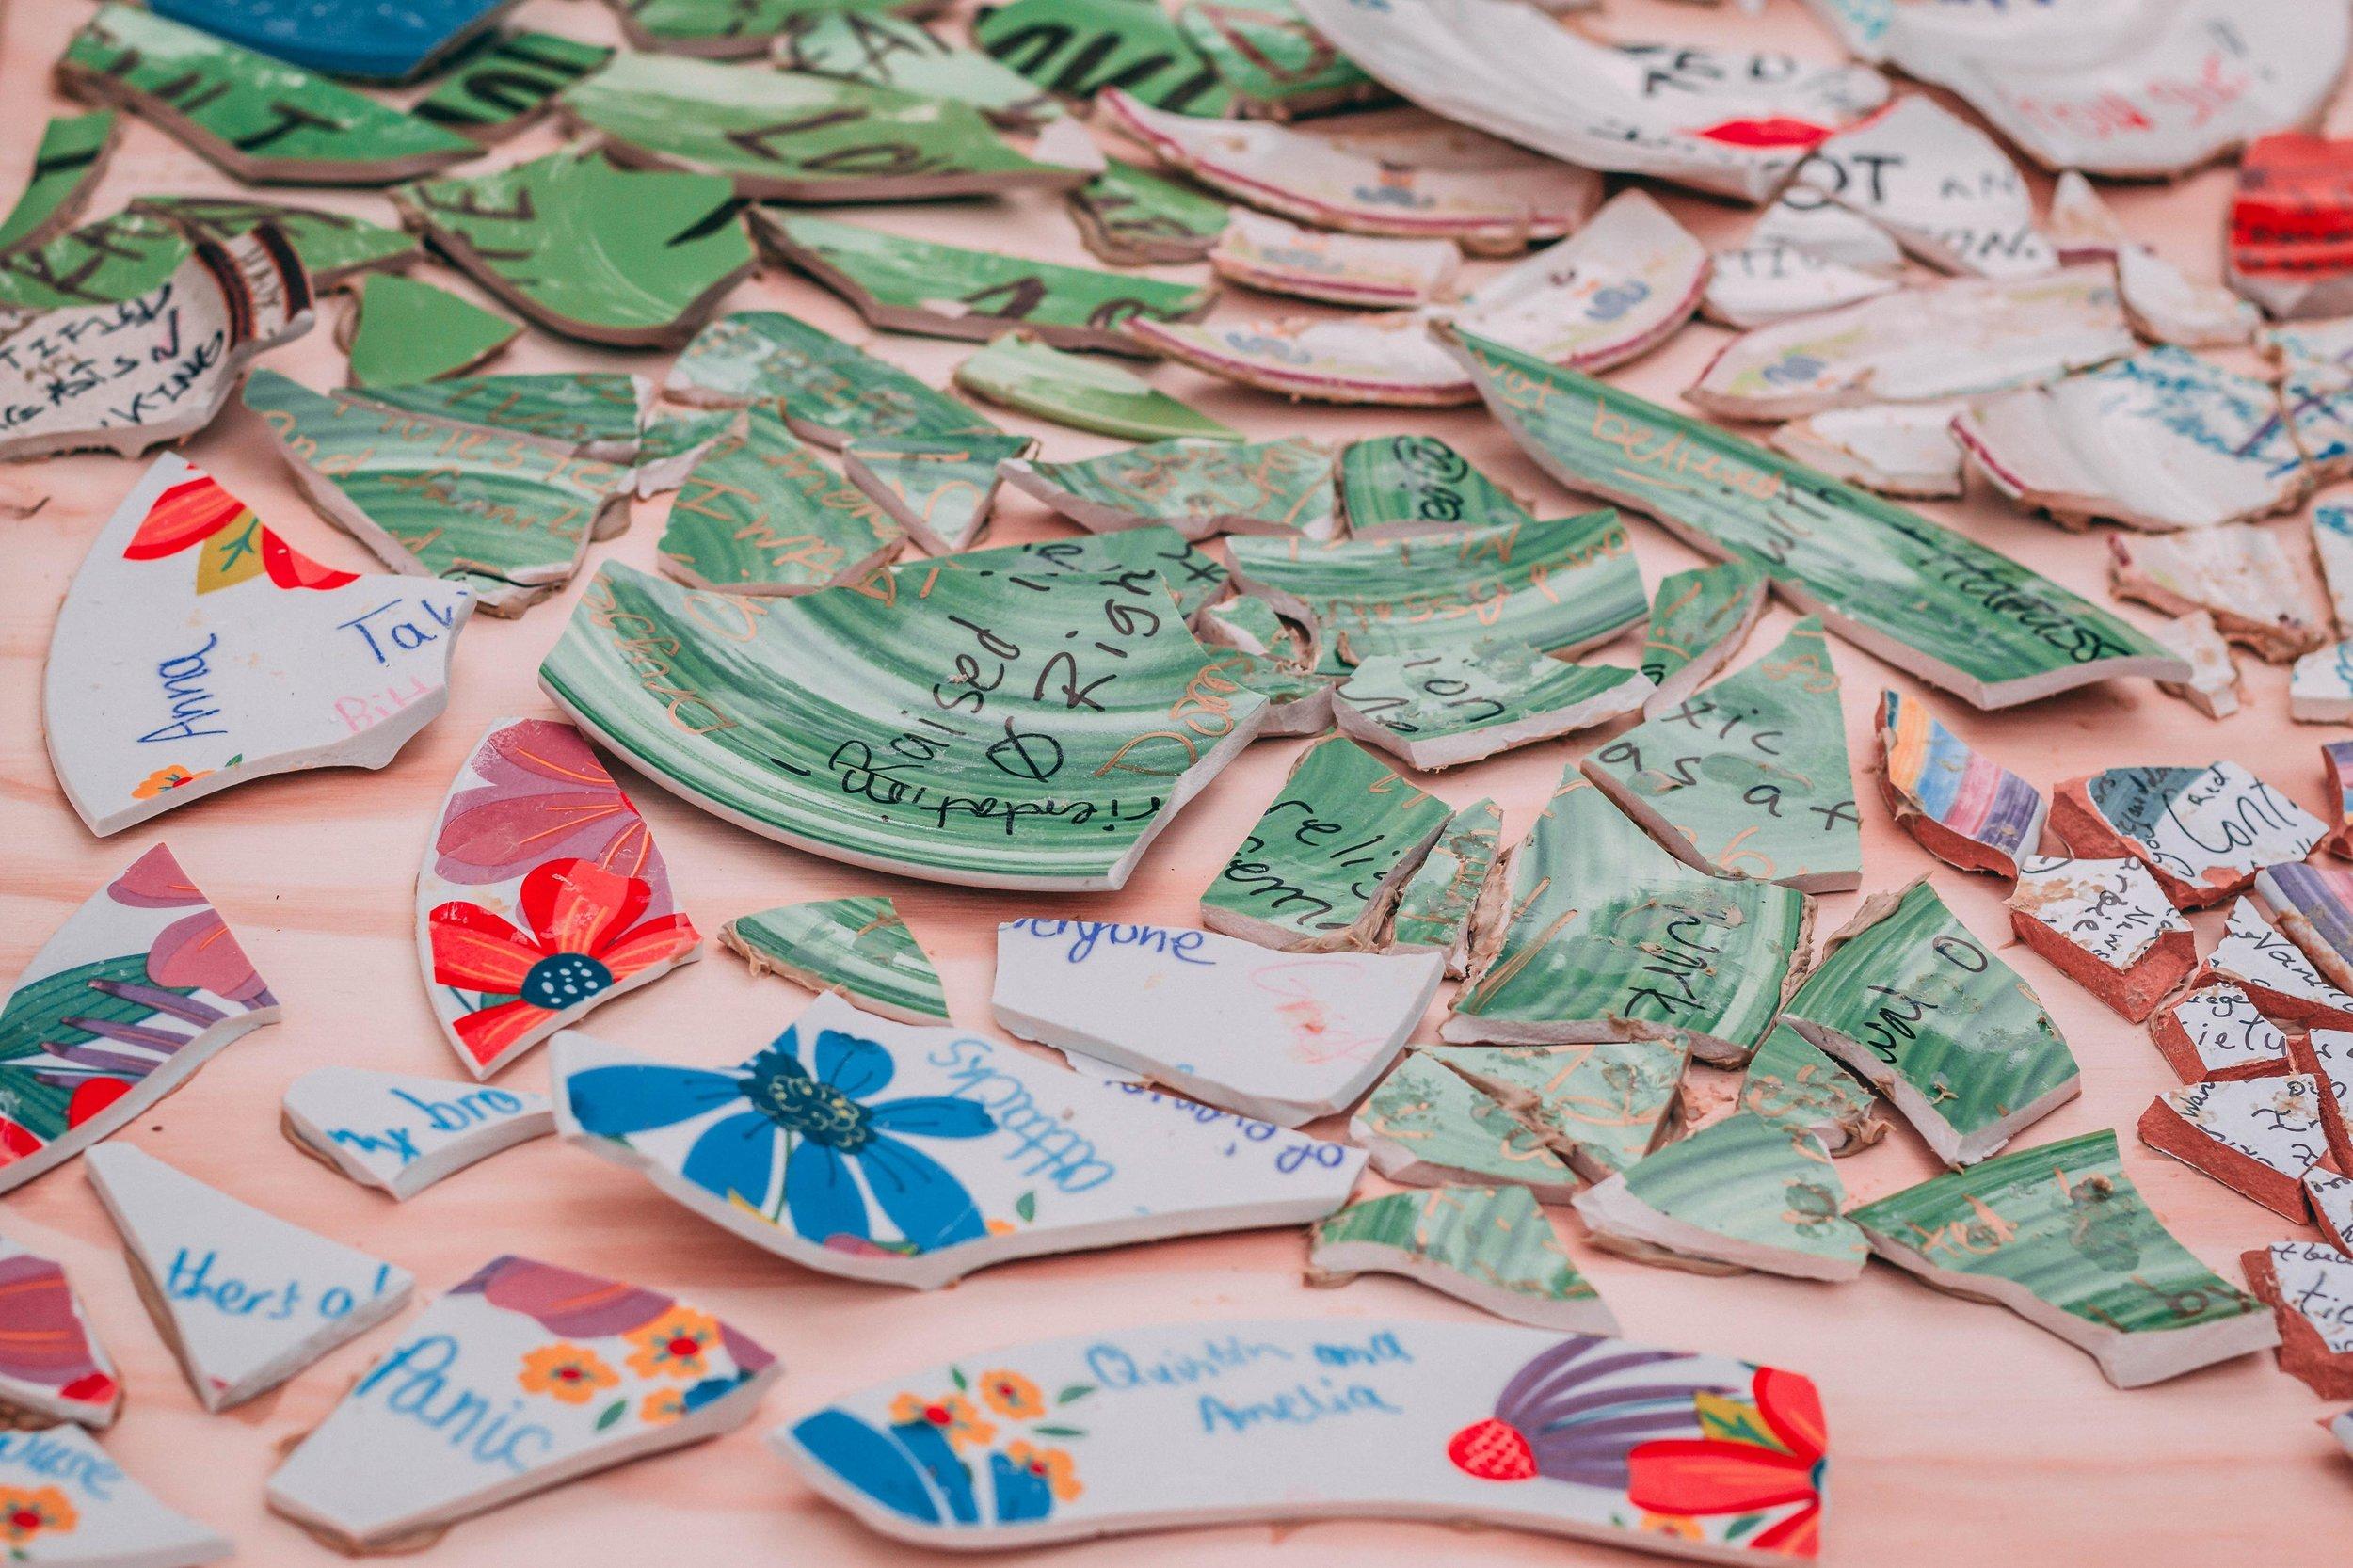 Broken plate shards at the 2018 Slut Walk, Twin Cities  Fragmentary , Unspoken Voices event.